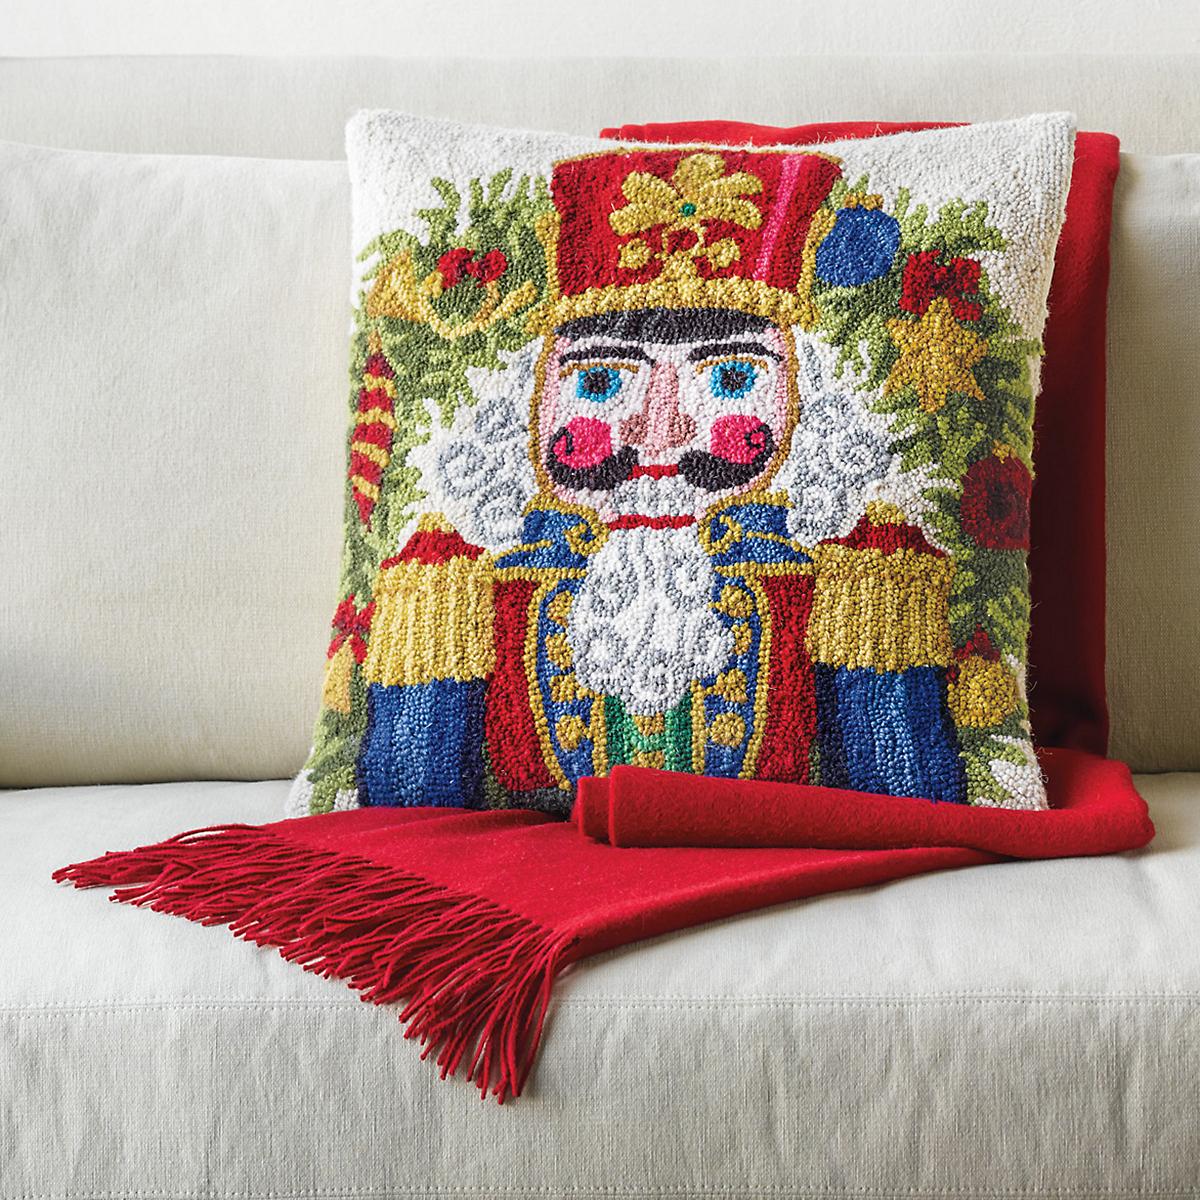 Nutcracker Hooked Pillow